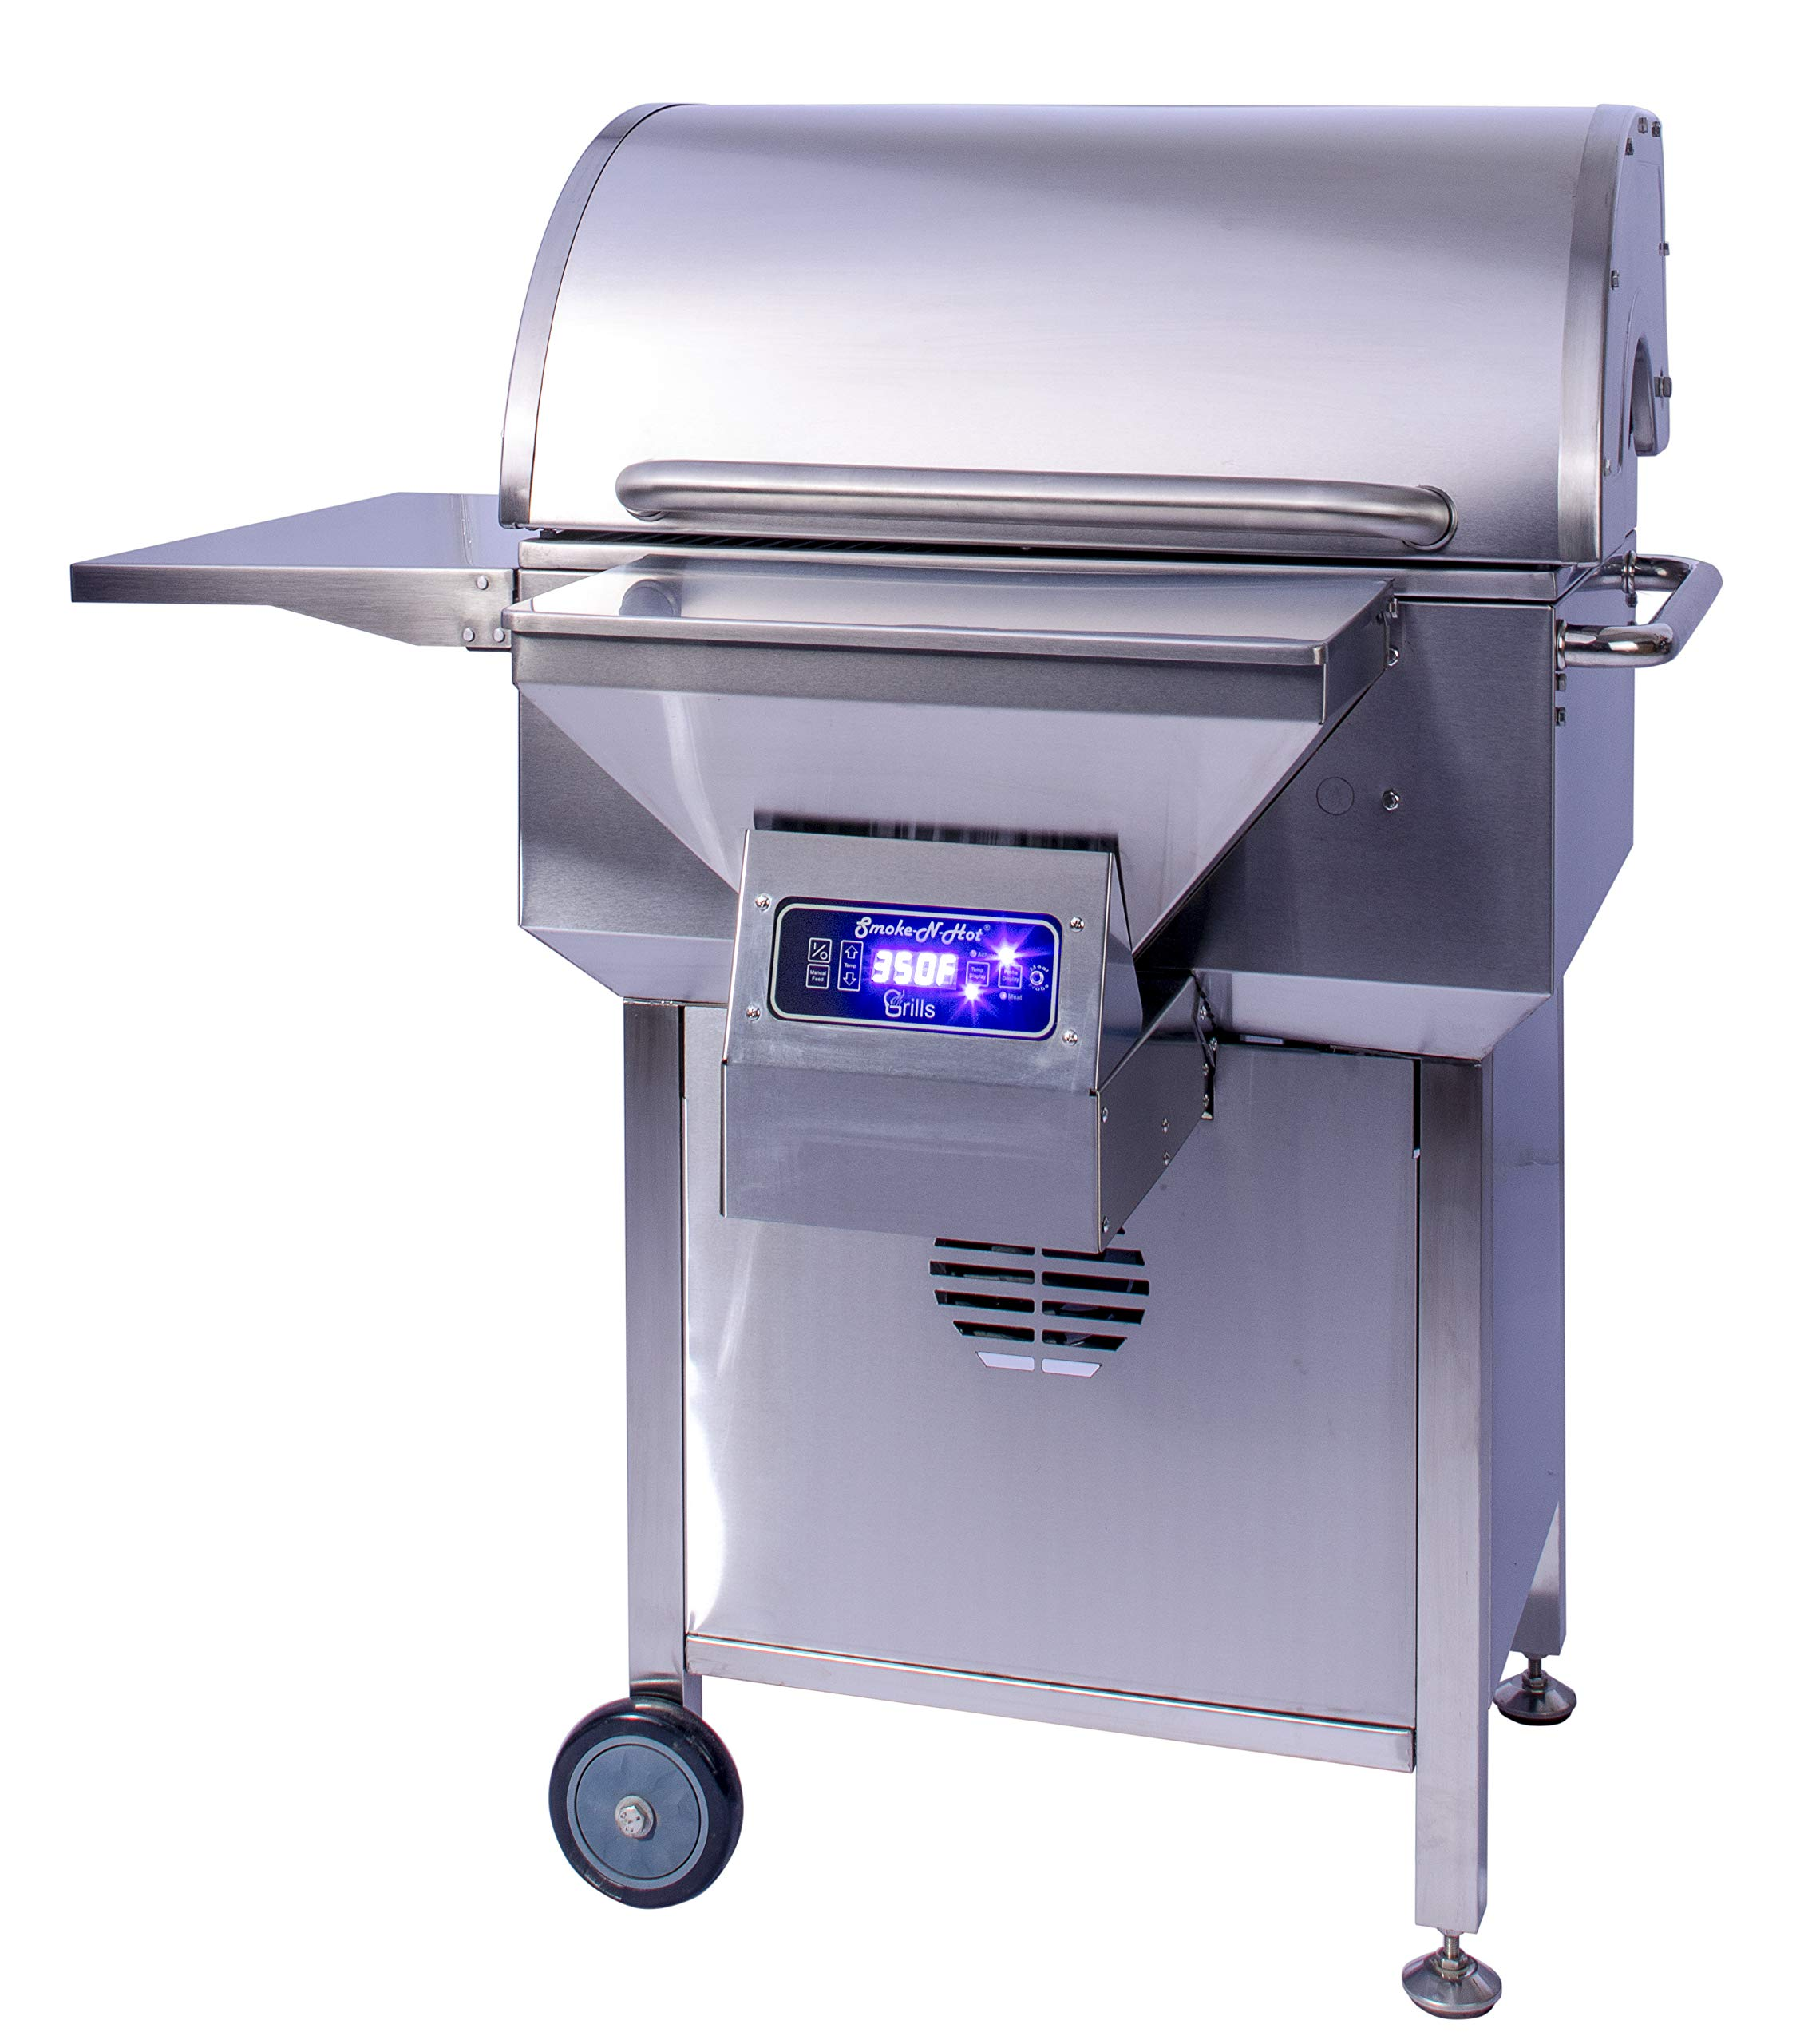 Smoke N Hot Eco Grill w/Cabinet